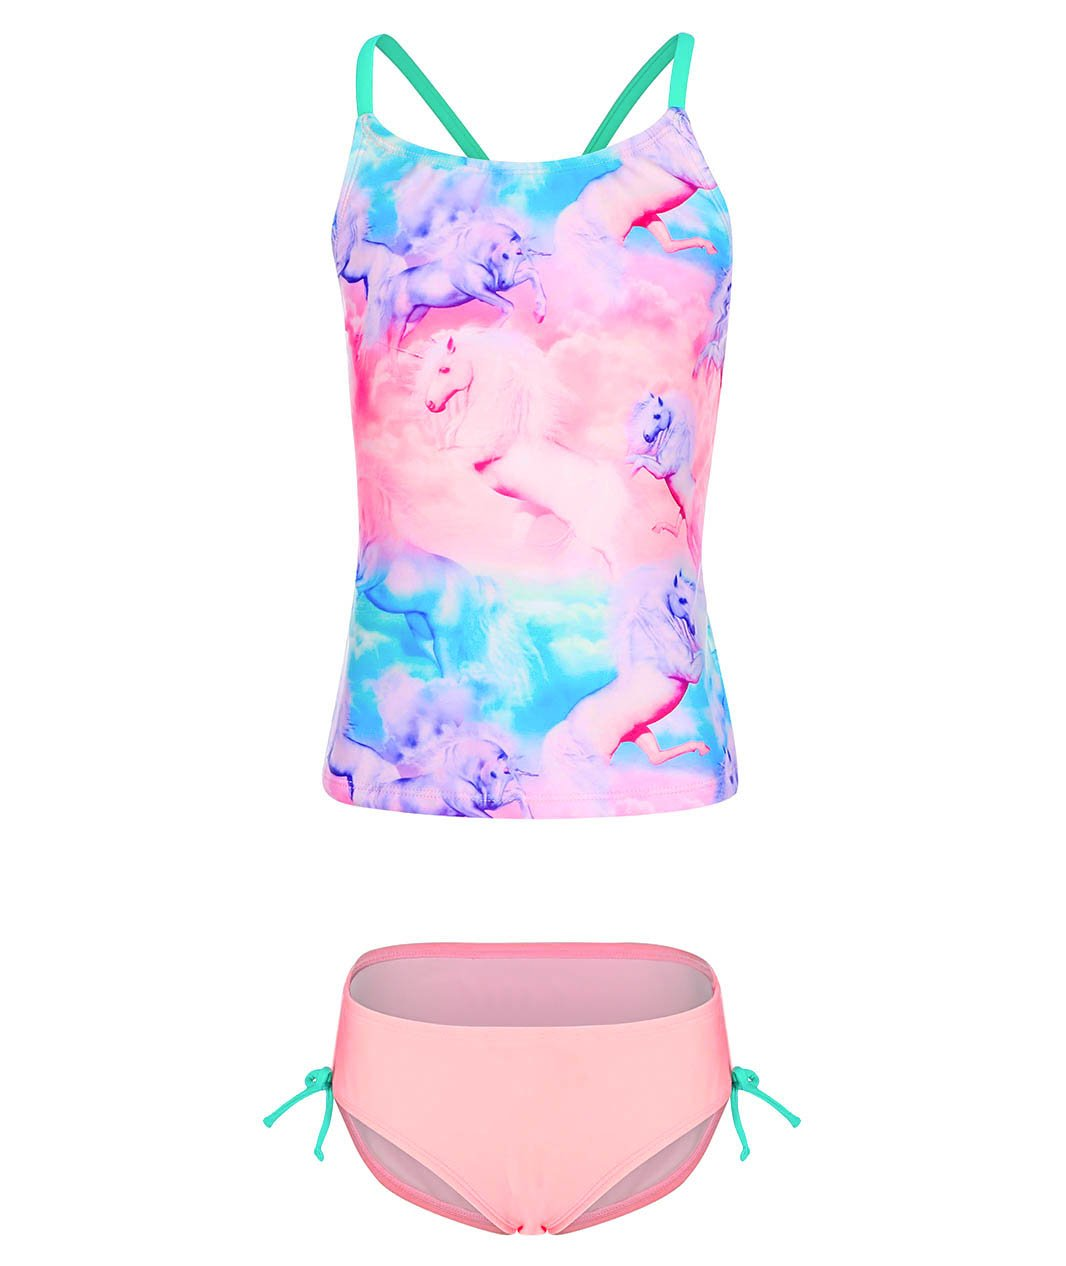 BELLOO Girls Tankini 2 Piece Bathing Suits with Unicorn, Pink, 7-8